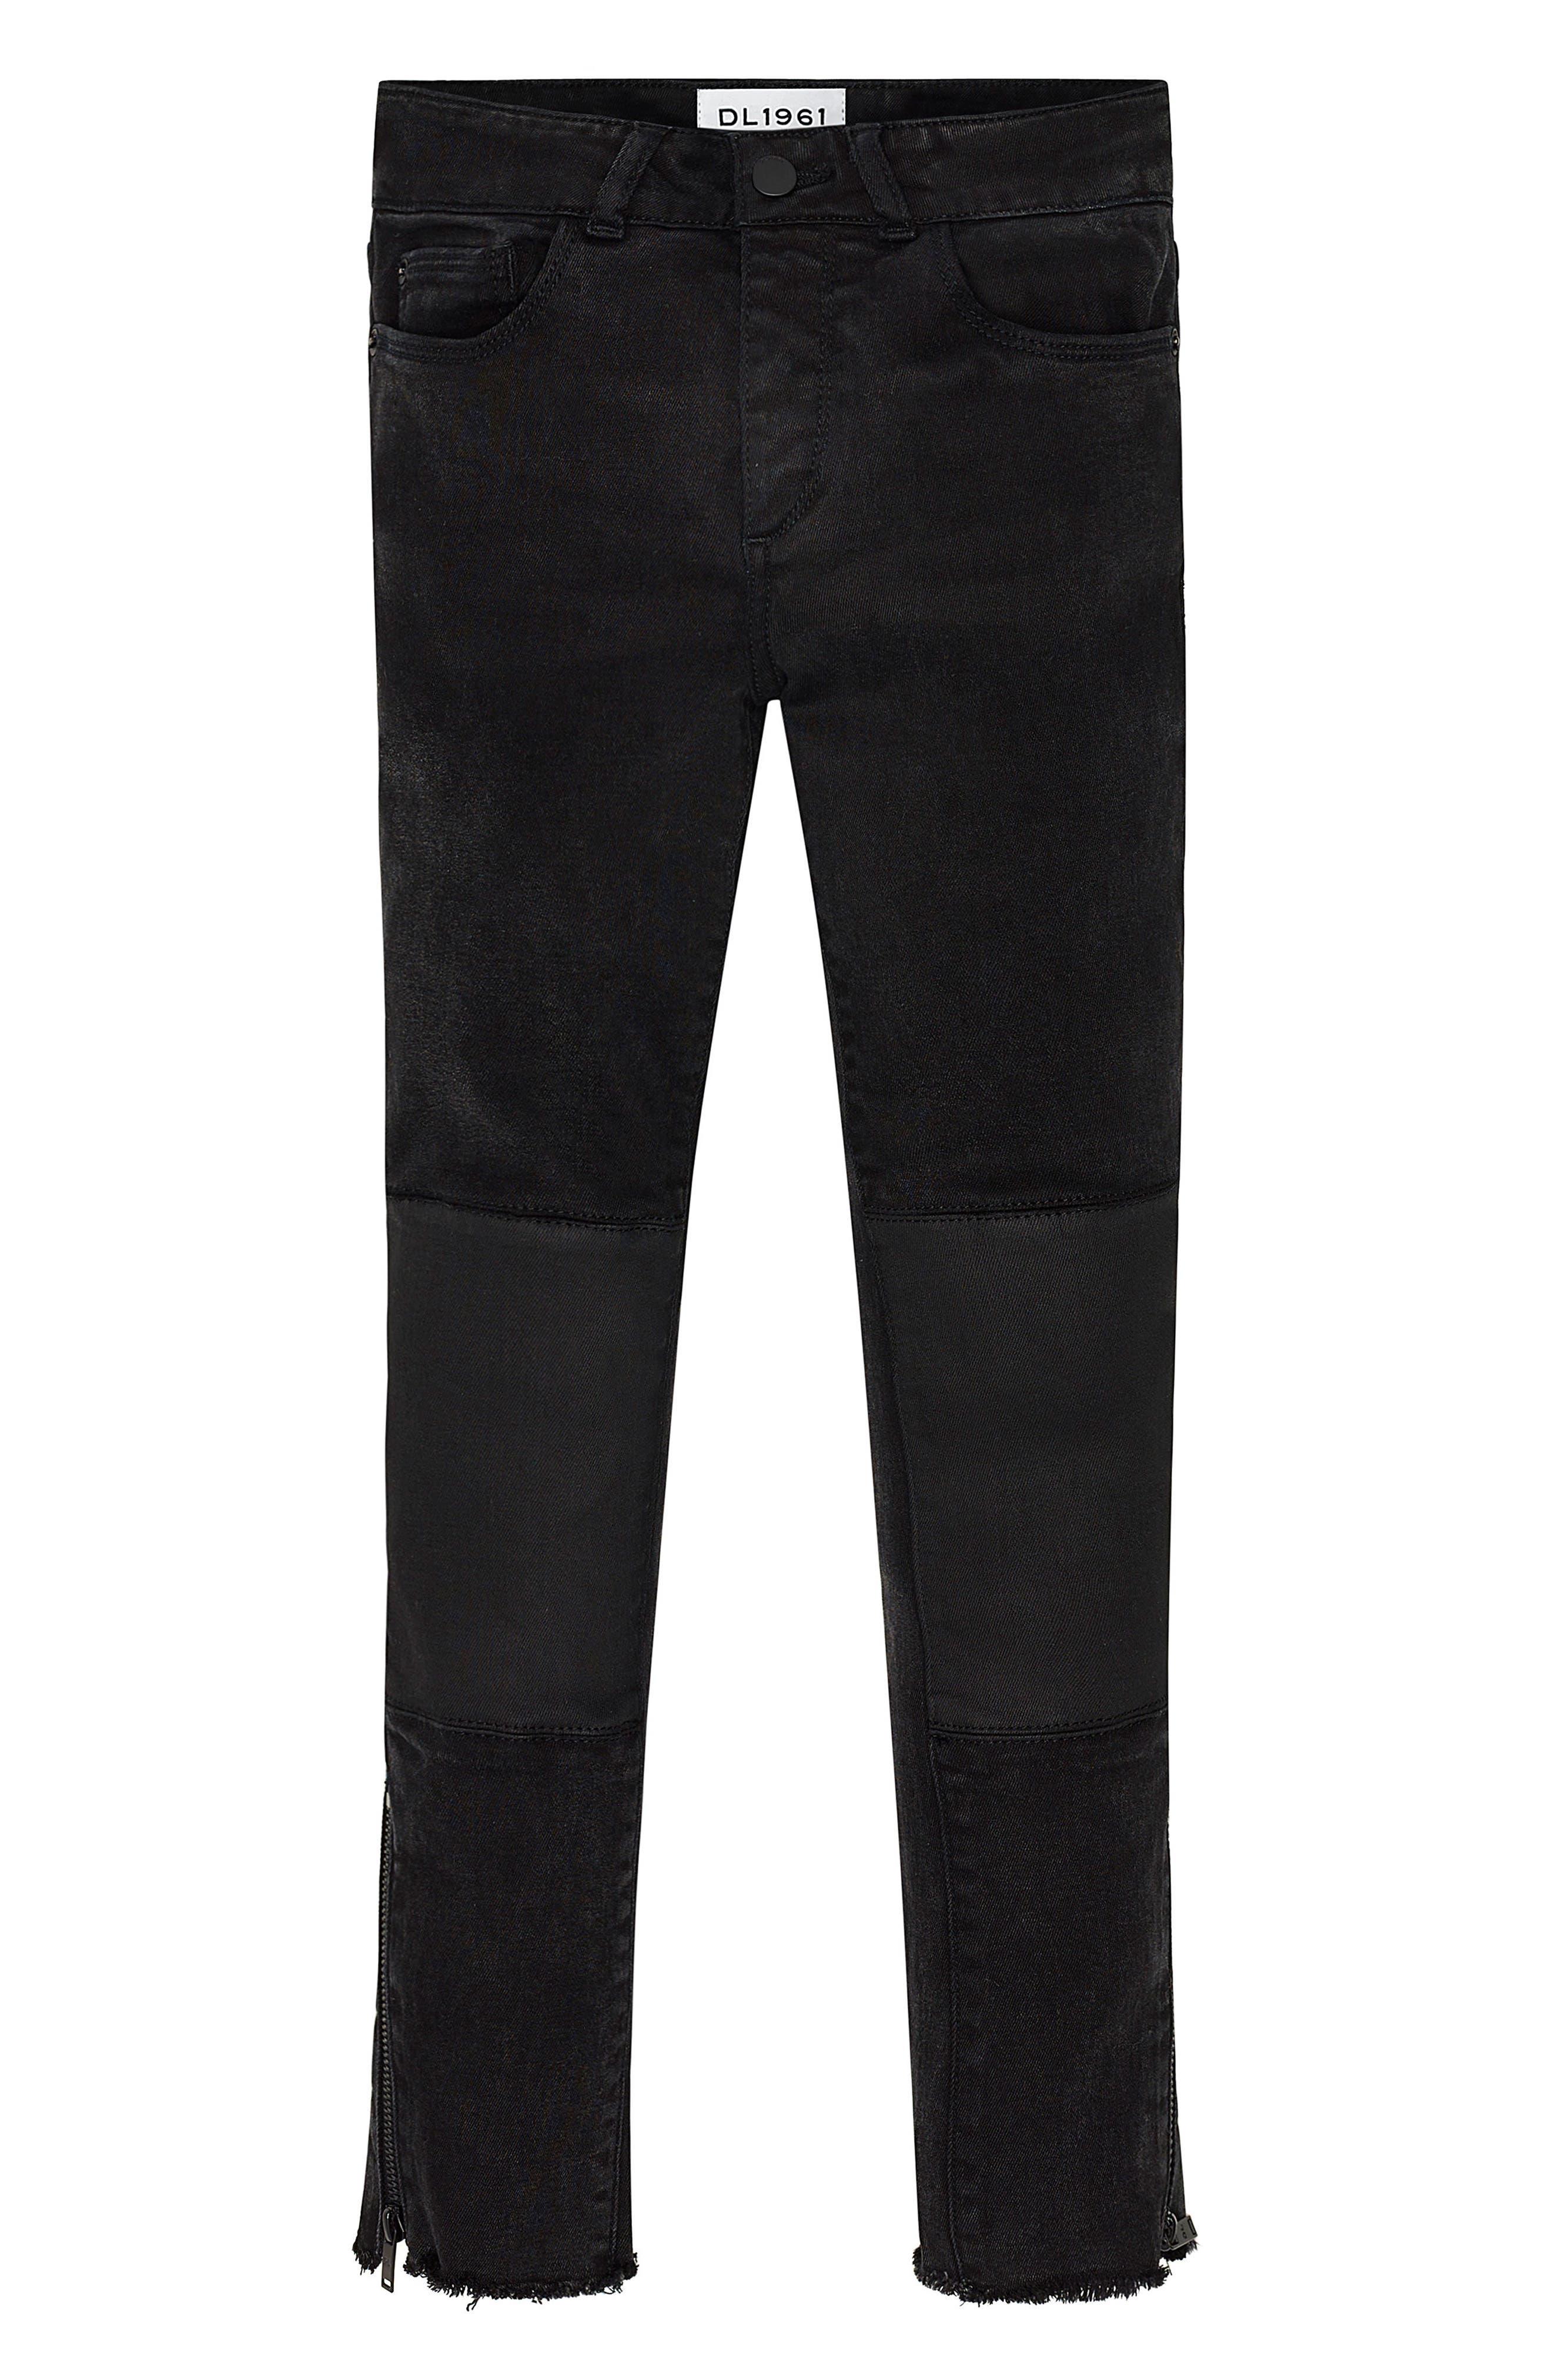 DL1961 Chloe Moto Skinny Jeans (Big Girls)